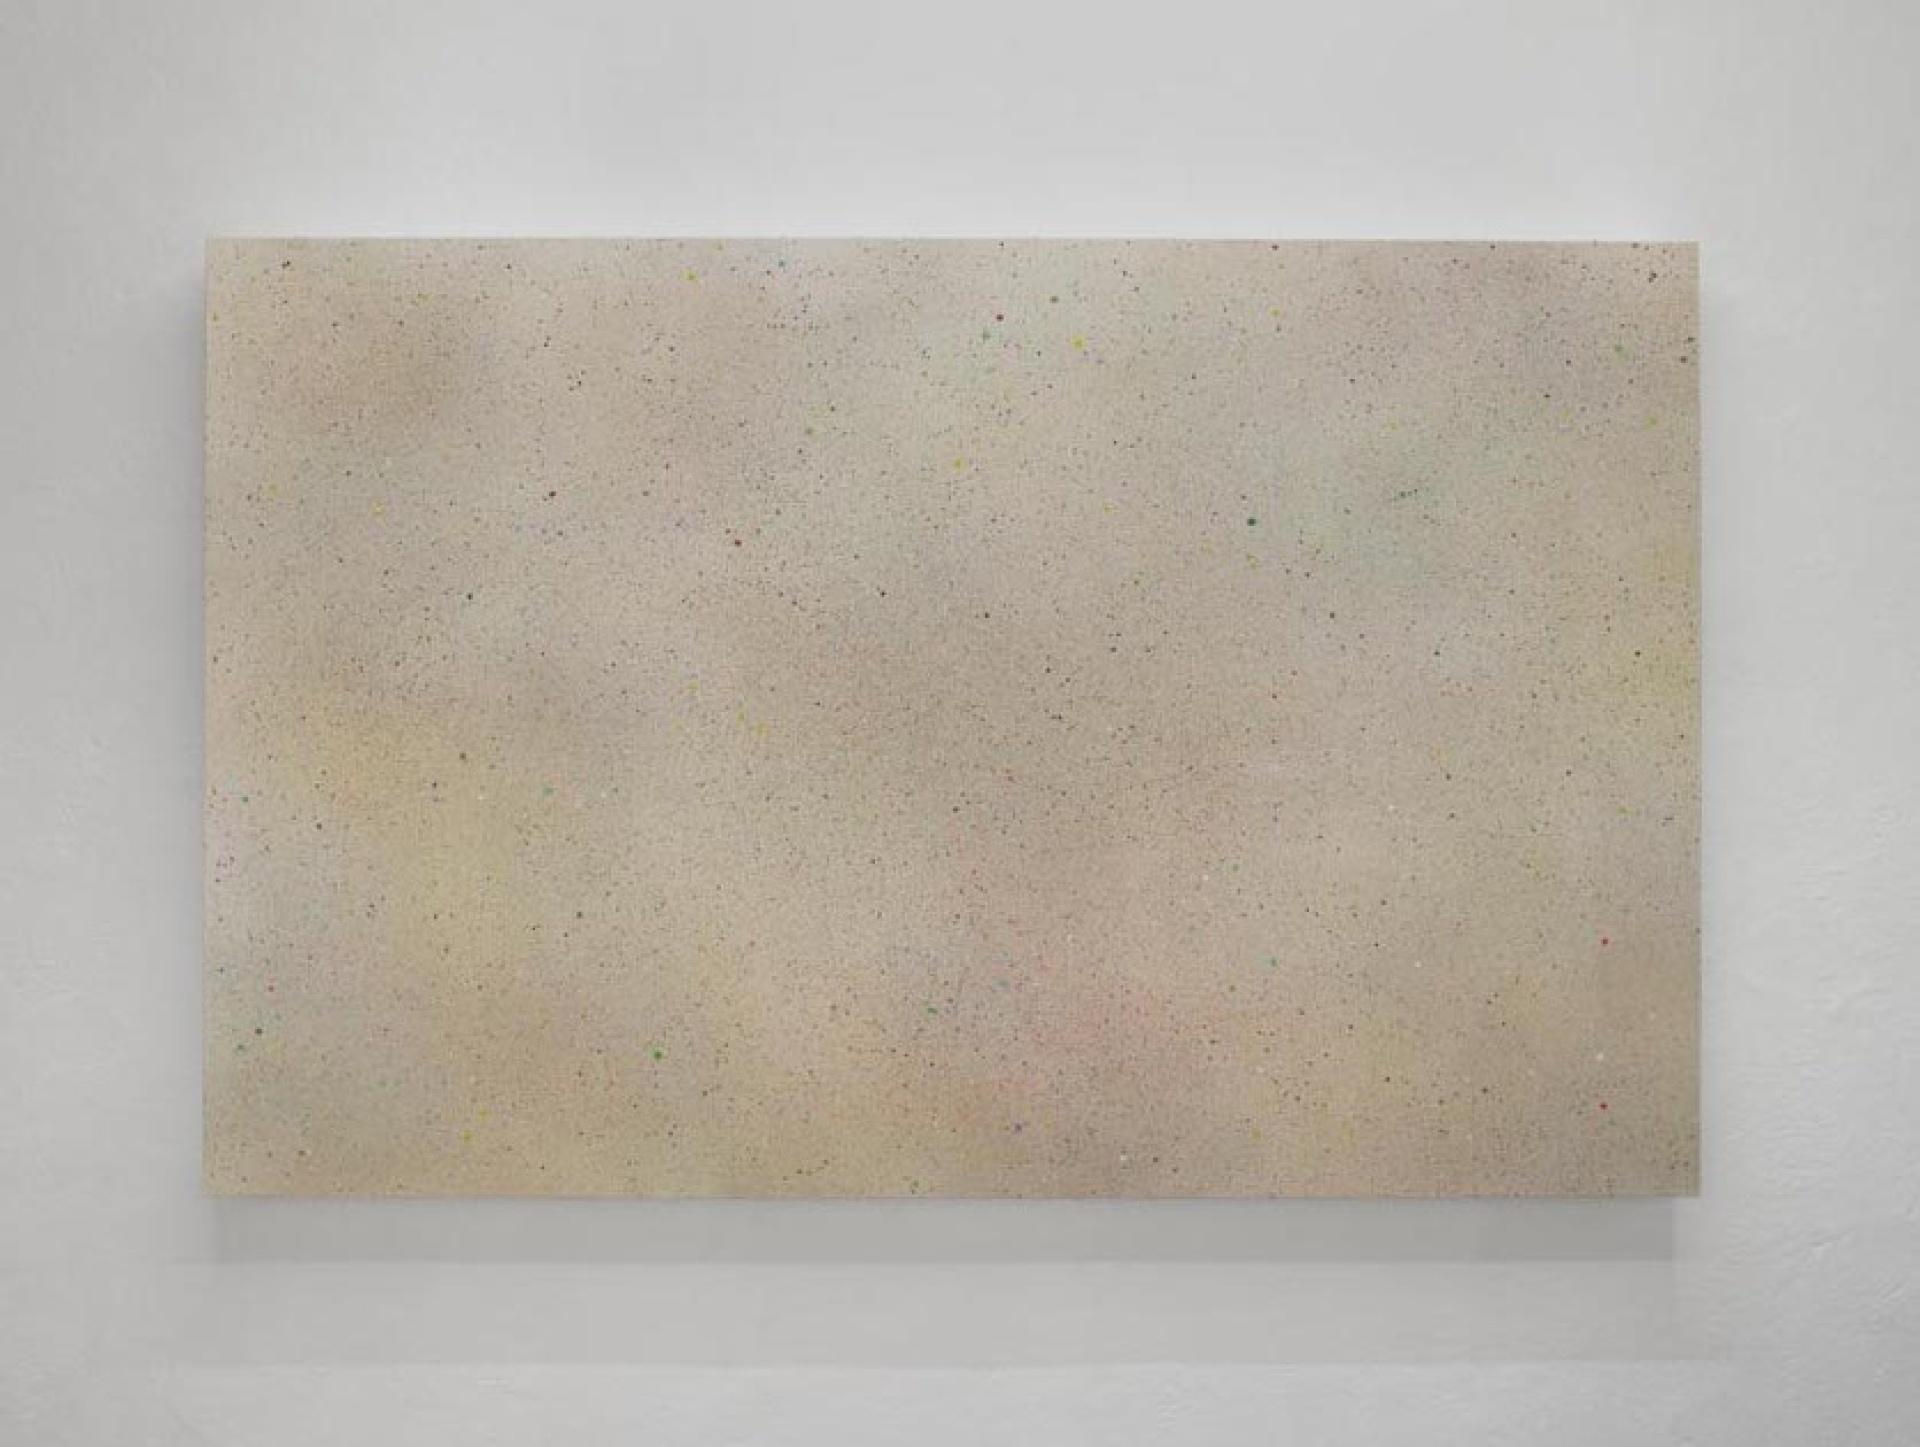 S/T. MIxta s/lienzo. 130x195 cm. 2017